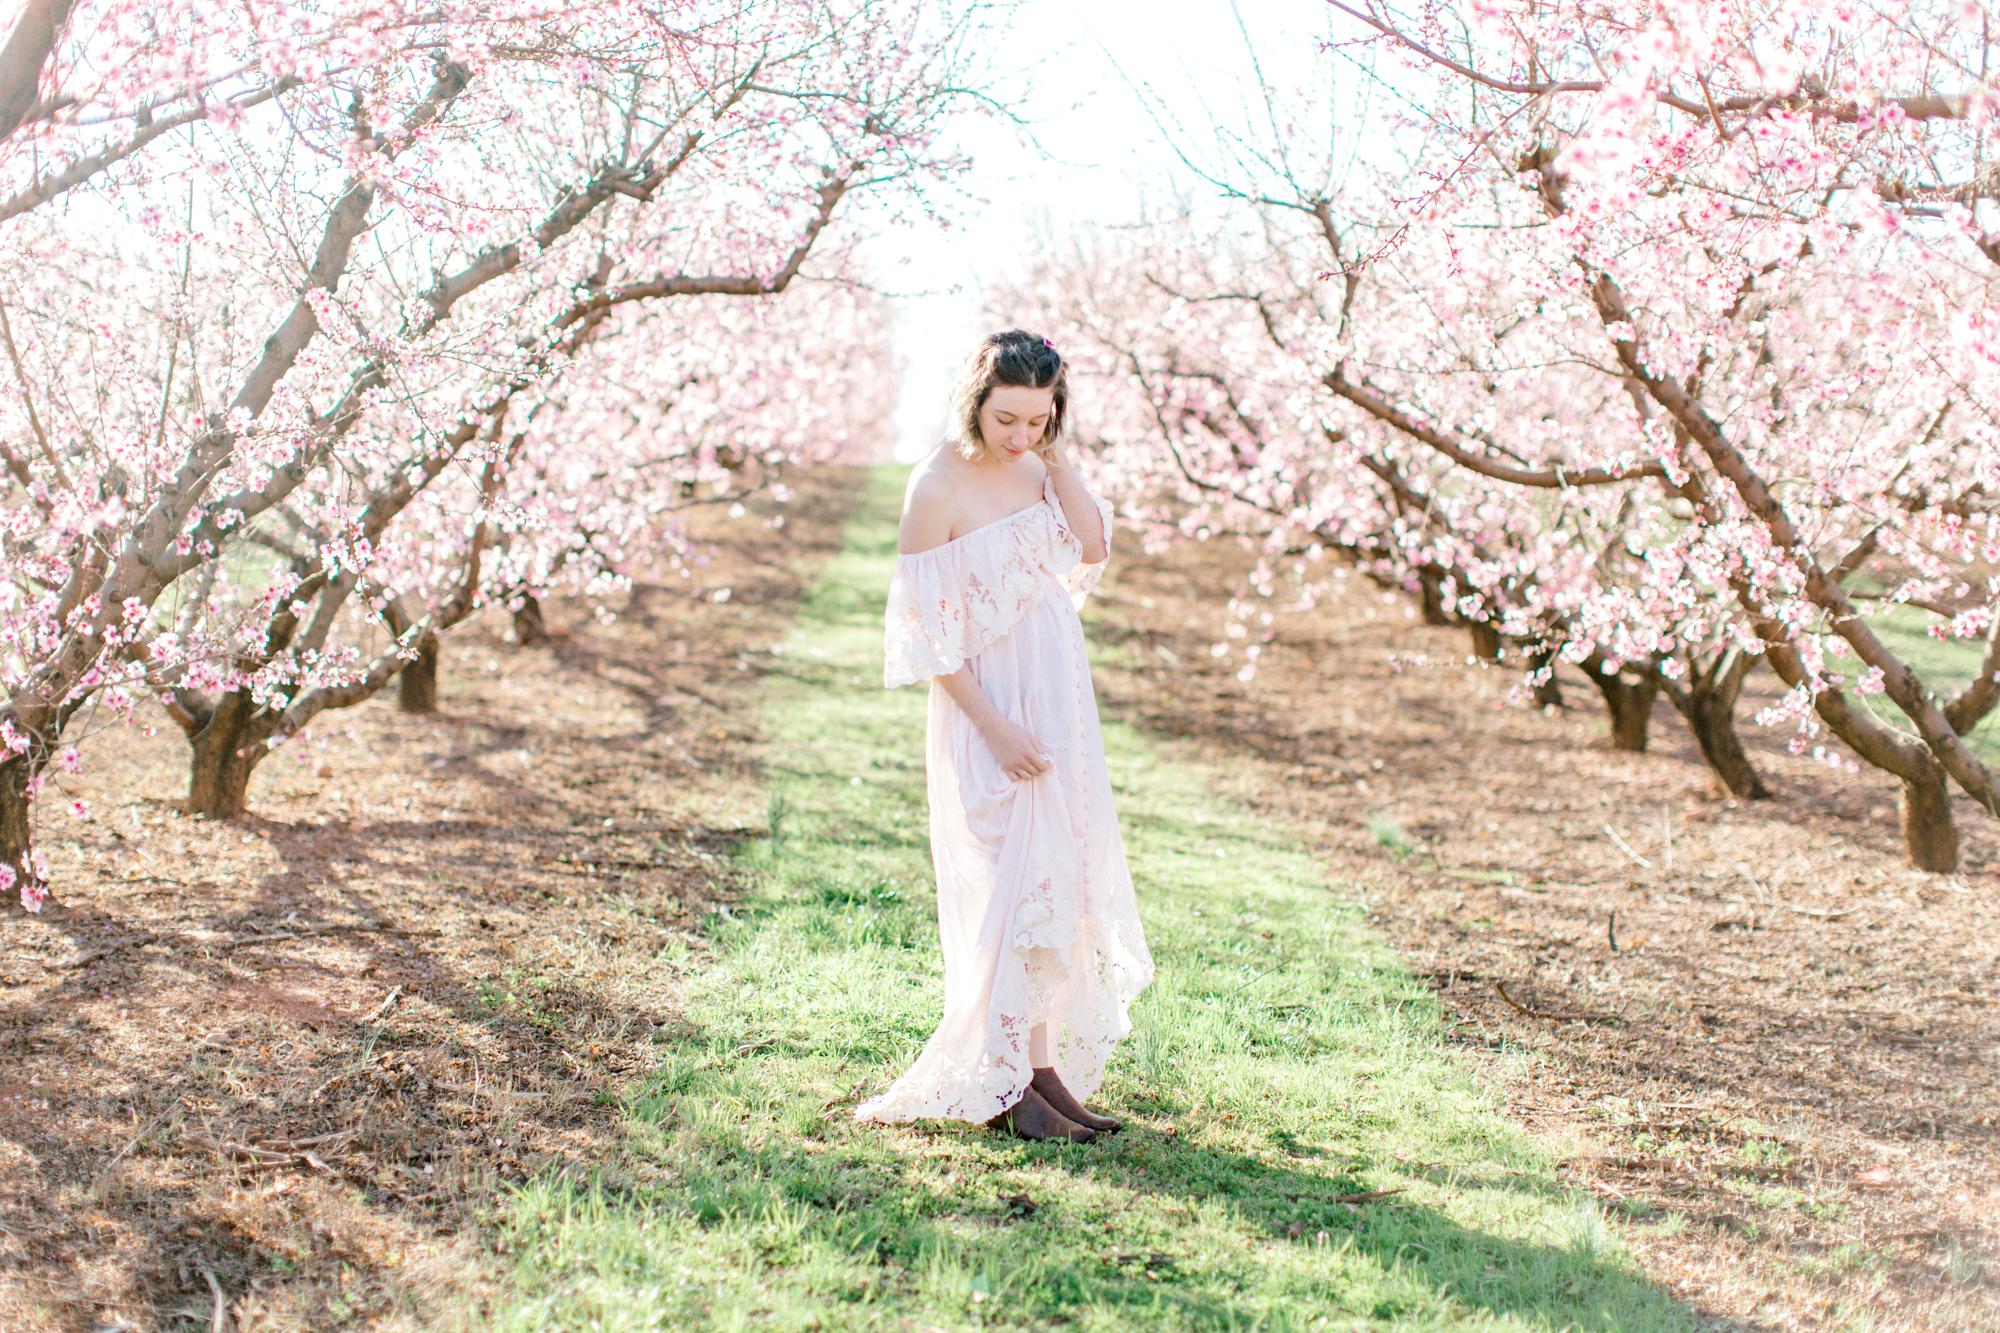 four corners photography peach blossom mini sessions peach blossom maternity session (12 of 25).jpg